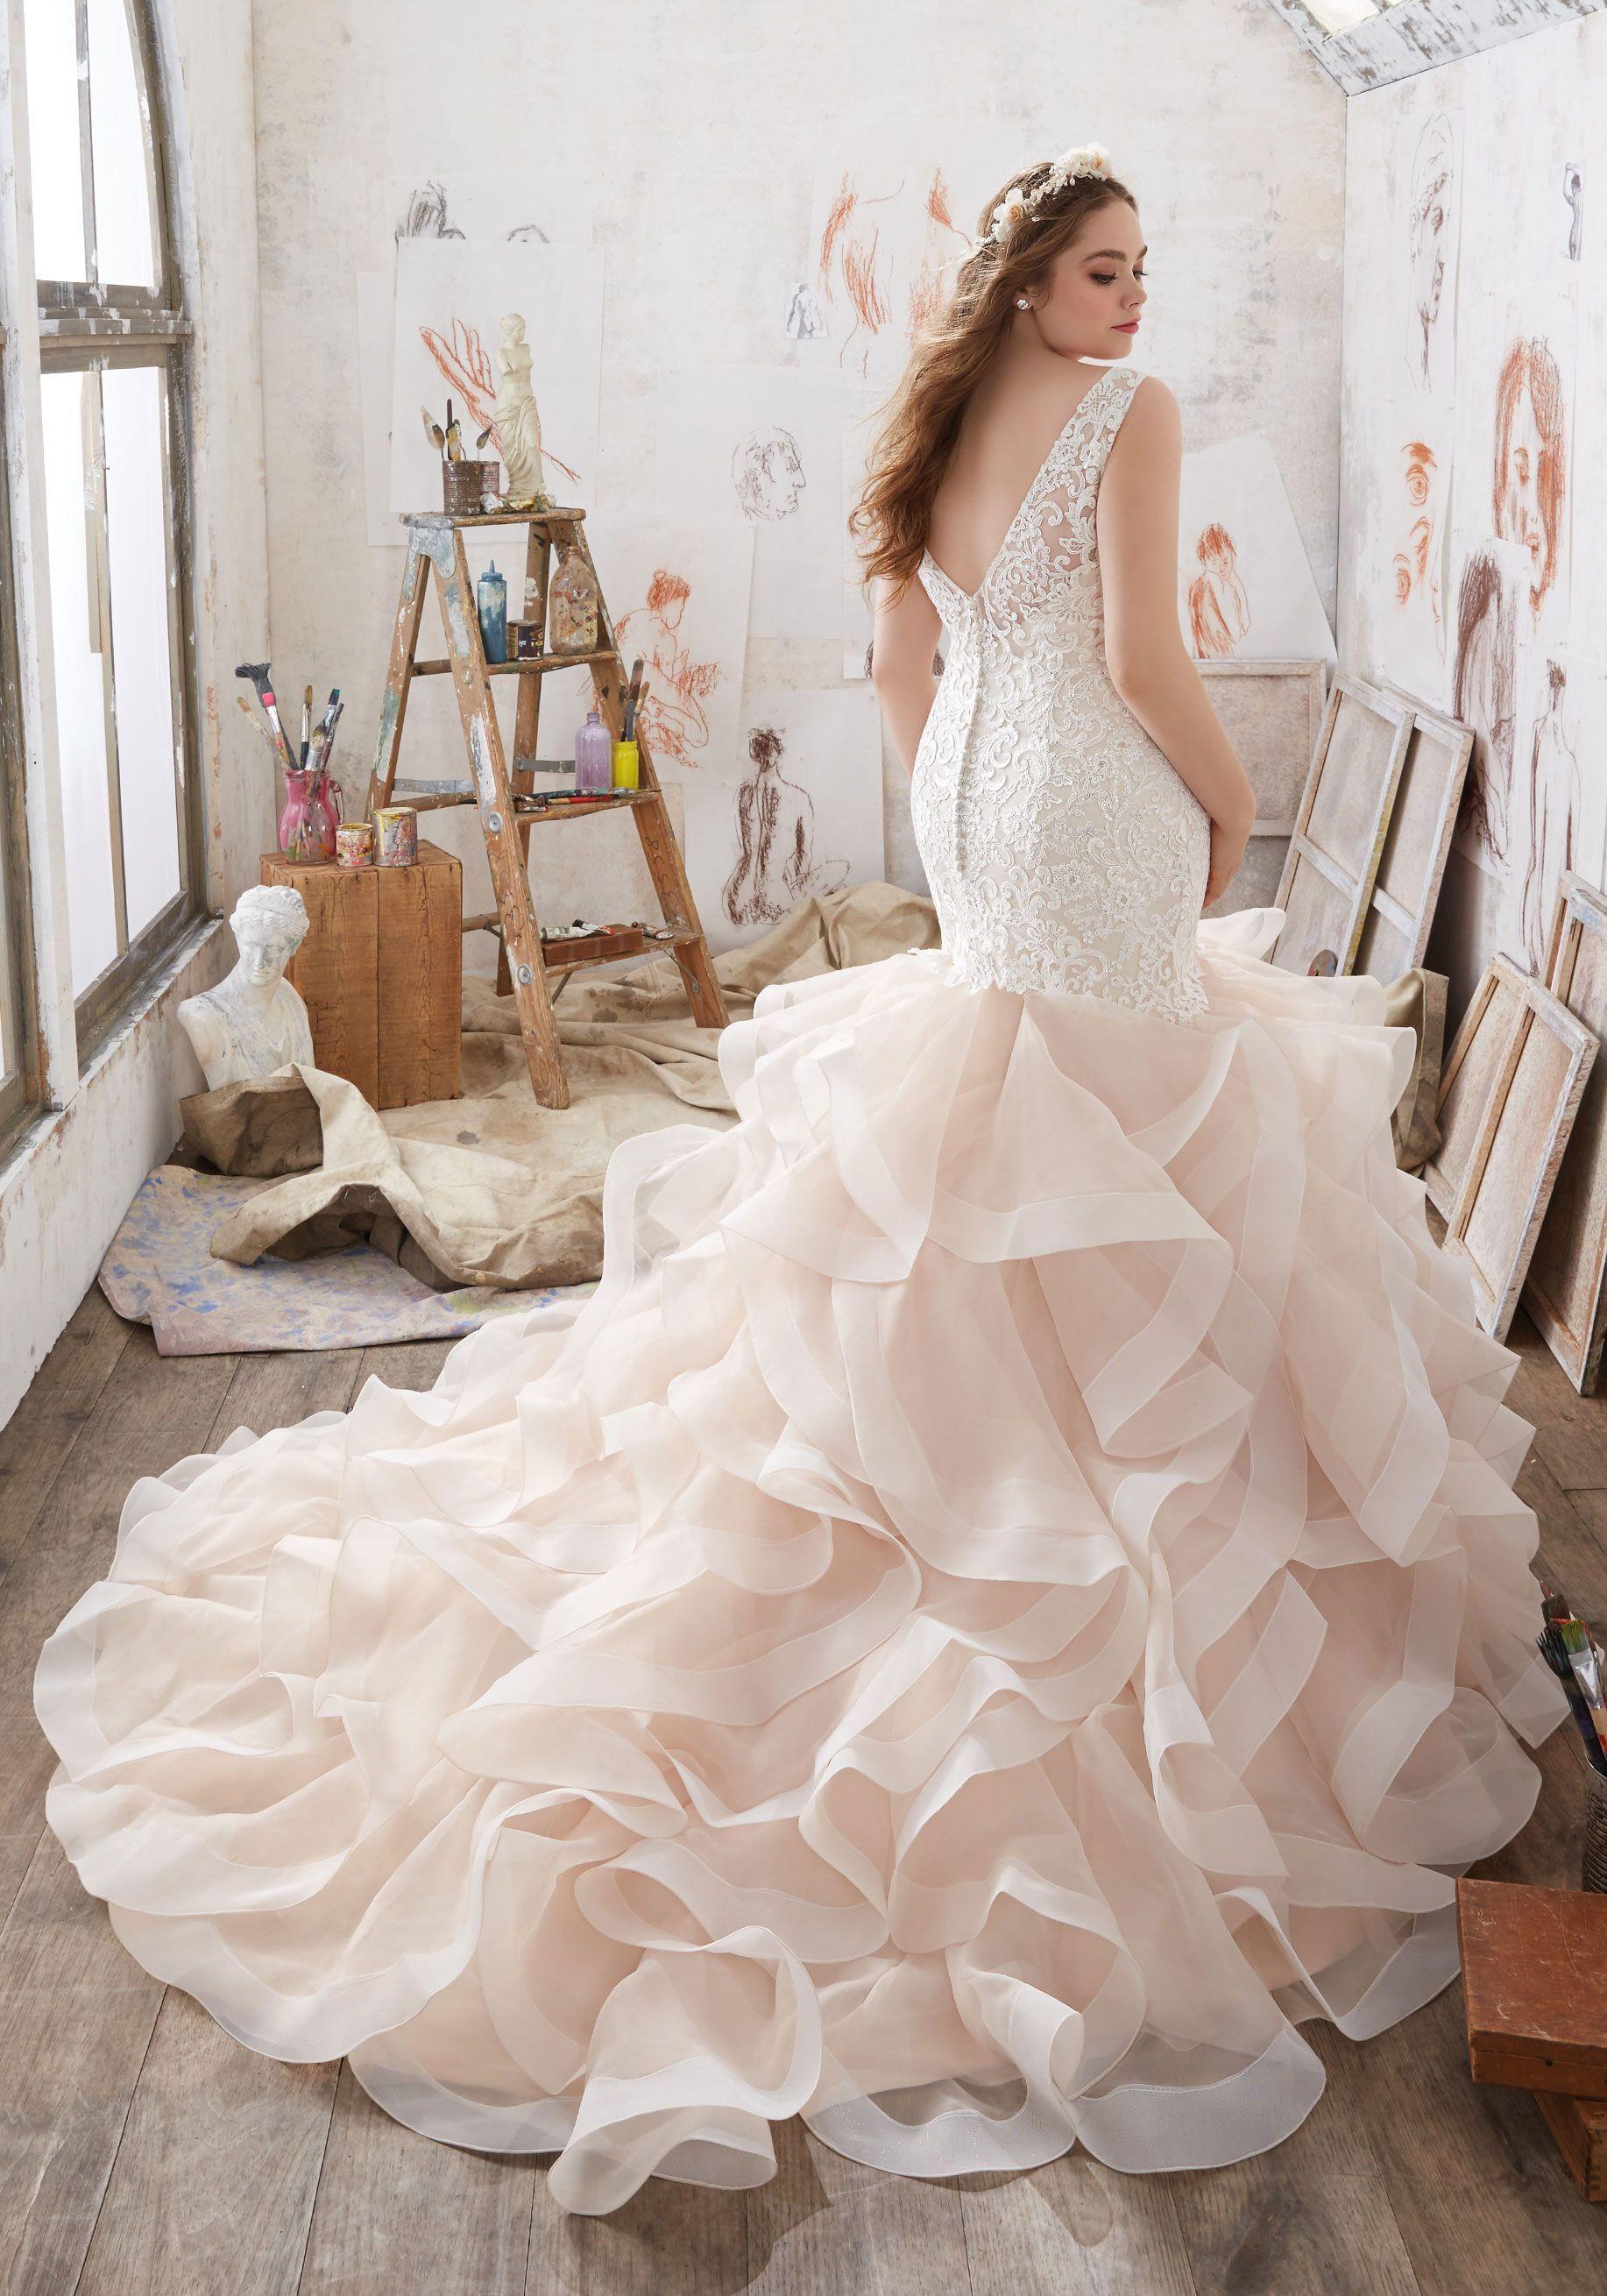 Plus size wedding dress rental  Mildred Wedding Dress  All In White  Pinterest  Wedding dresses